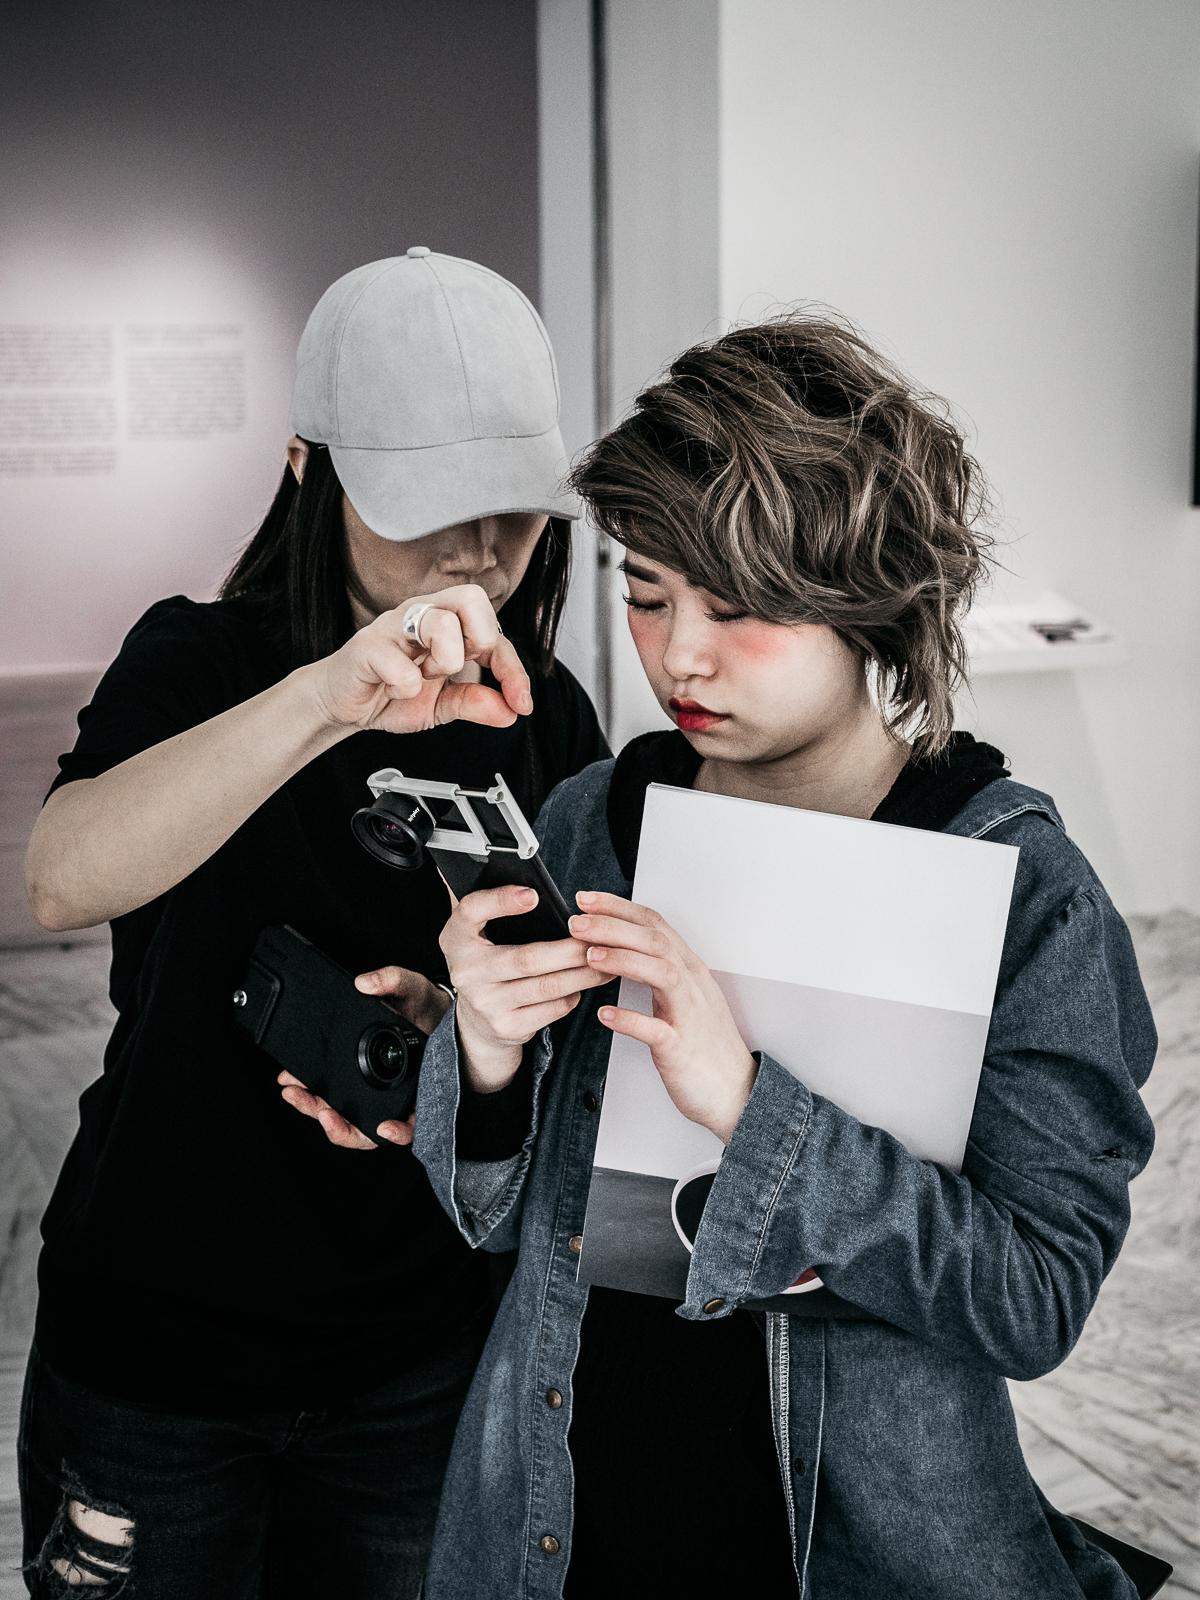 2019 Sep. bitplay 北美館建築空間攝影工作坊 - Olympus EM1 Markii 2512 - Yes! Please Enjoy by Fanning Tseng-24.jpg